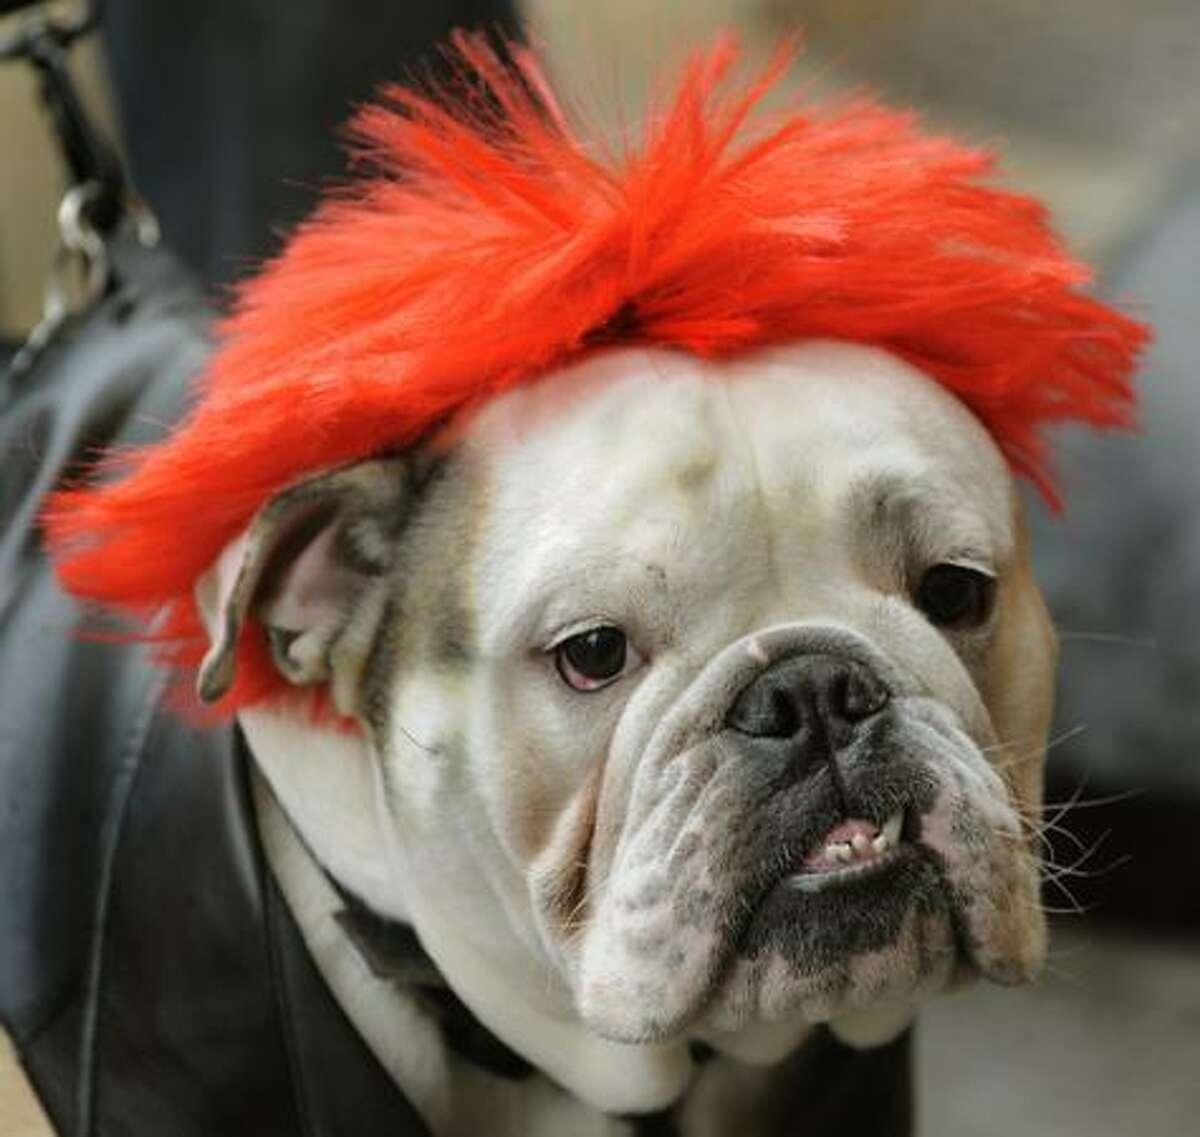 Leo, the bulldog, dressed as a